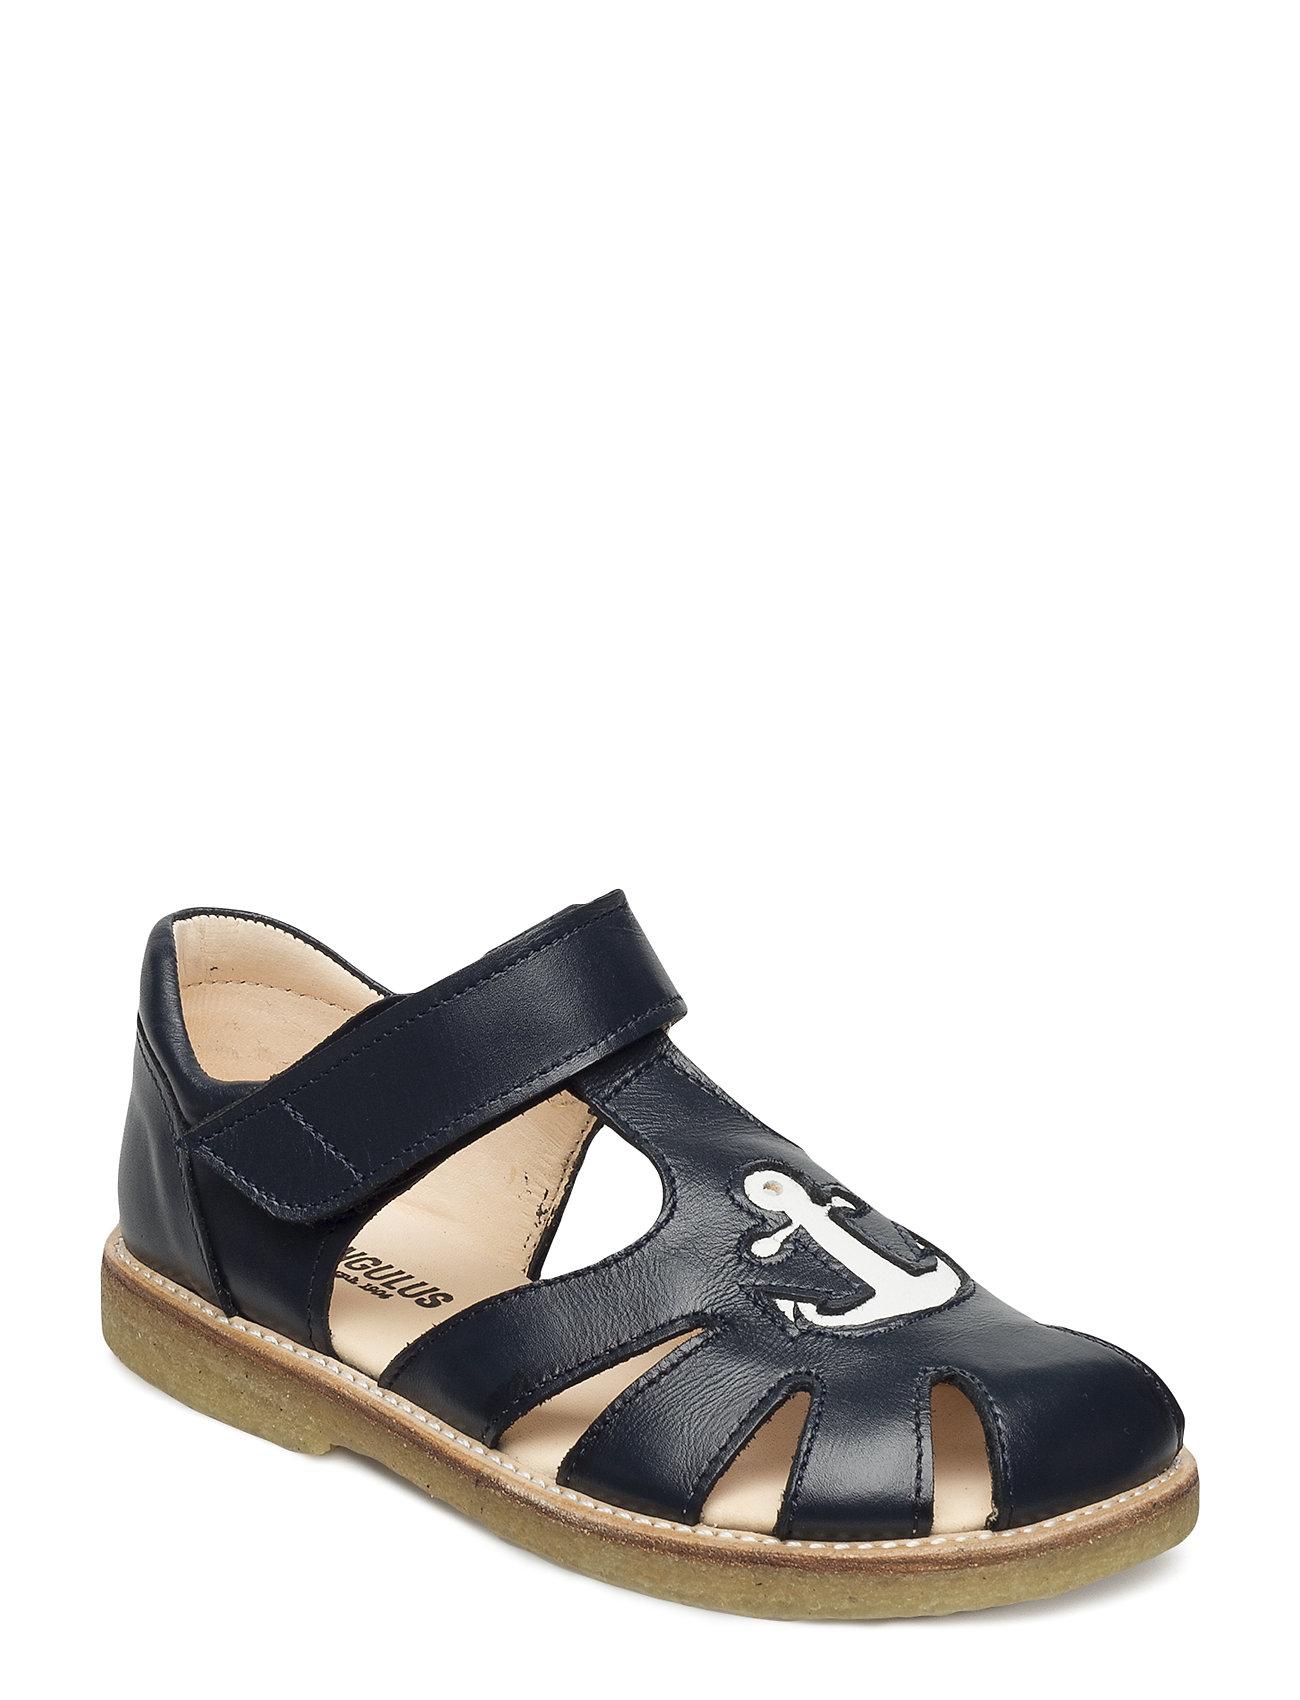 501d7178774 Trendy modetøj til alle|Mode - ANGULUS - Kids Shoes Sandals